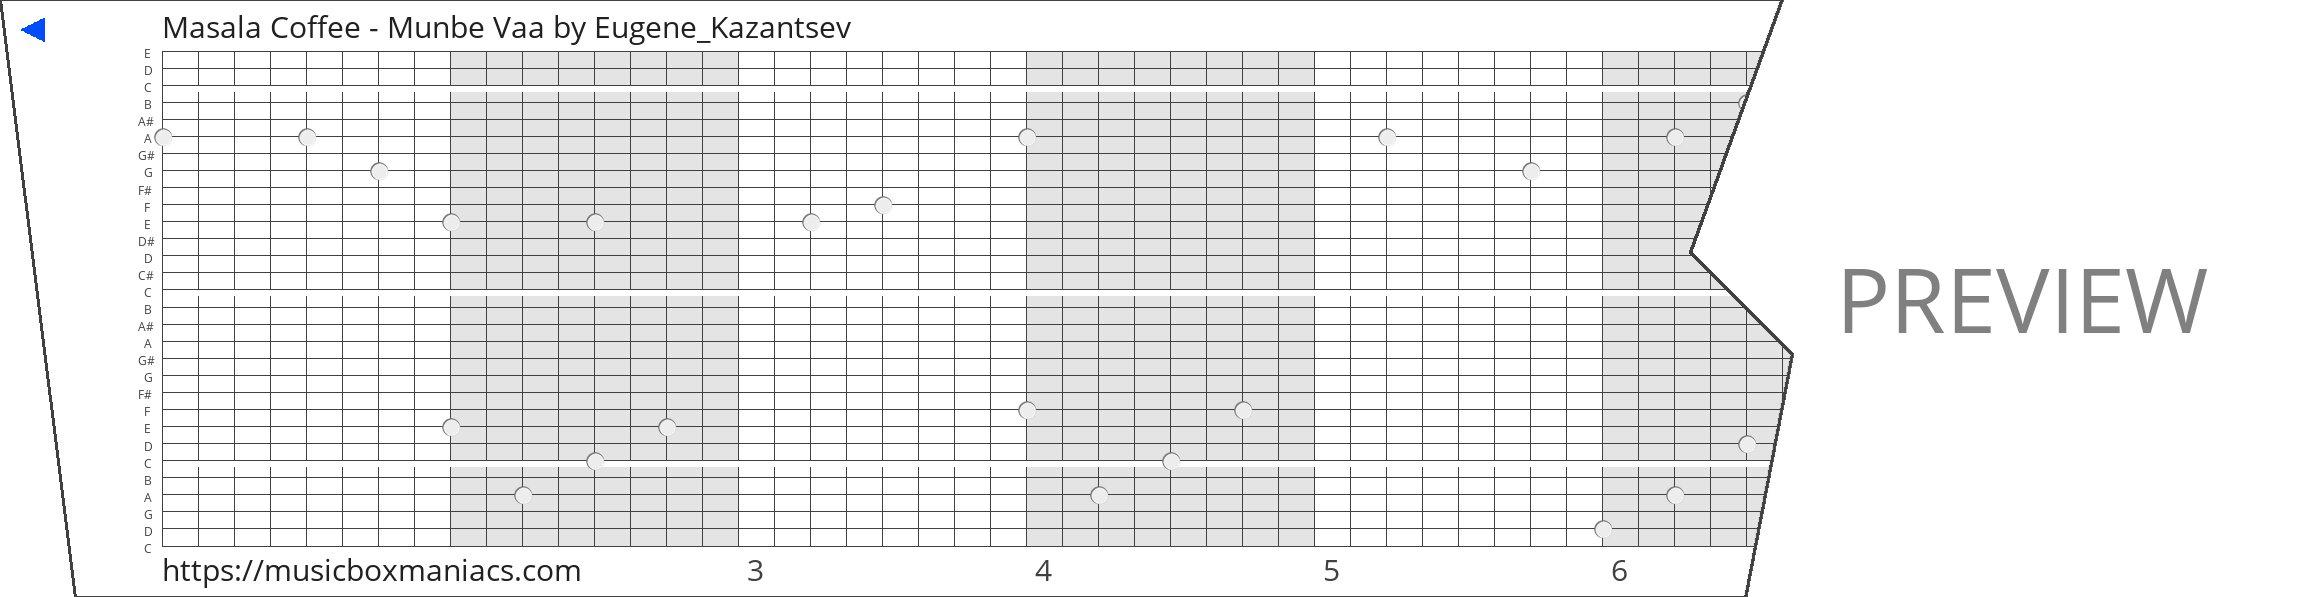 Masala Coffee - Munbe Vaa 30 note music box paper strip